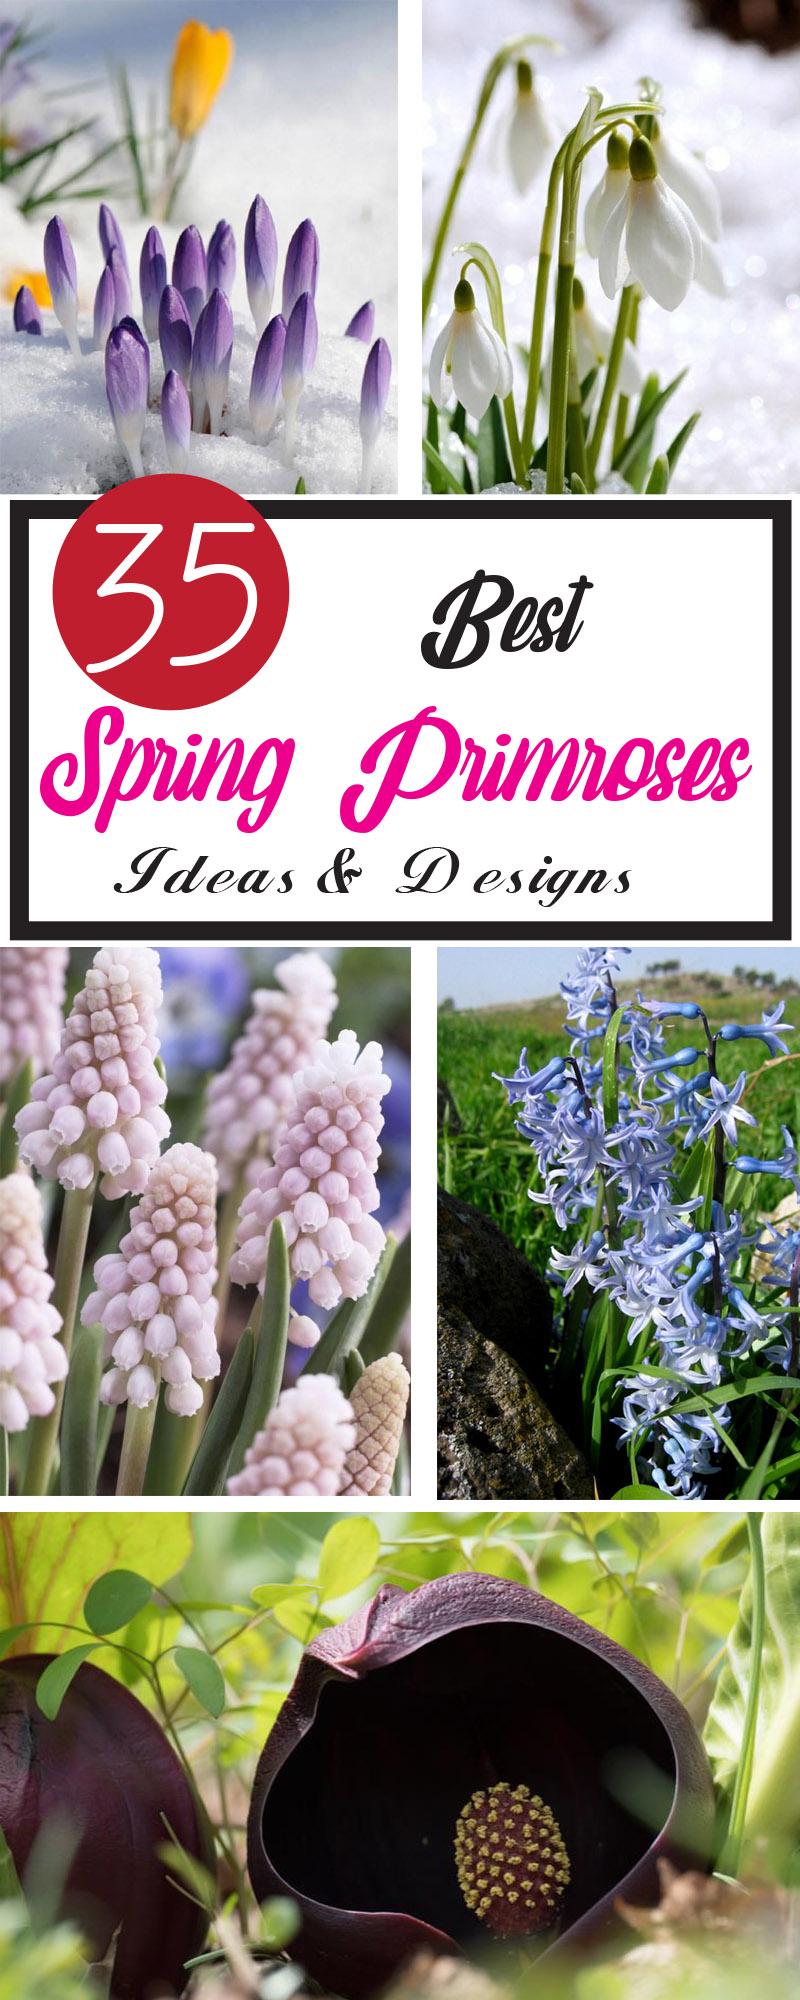 best spring primroses ideas and designs